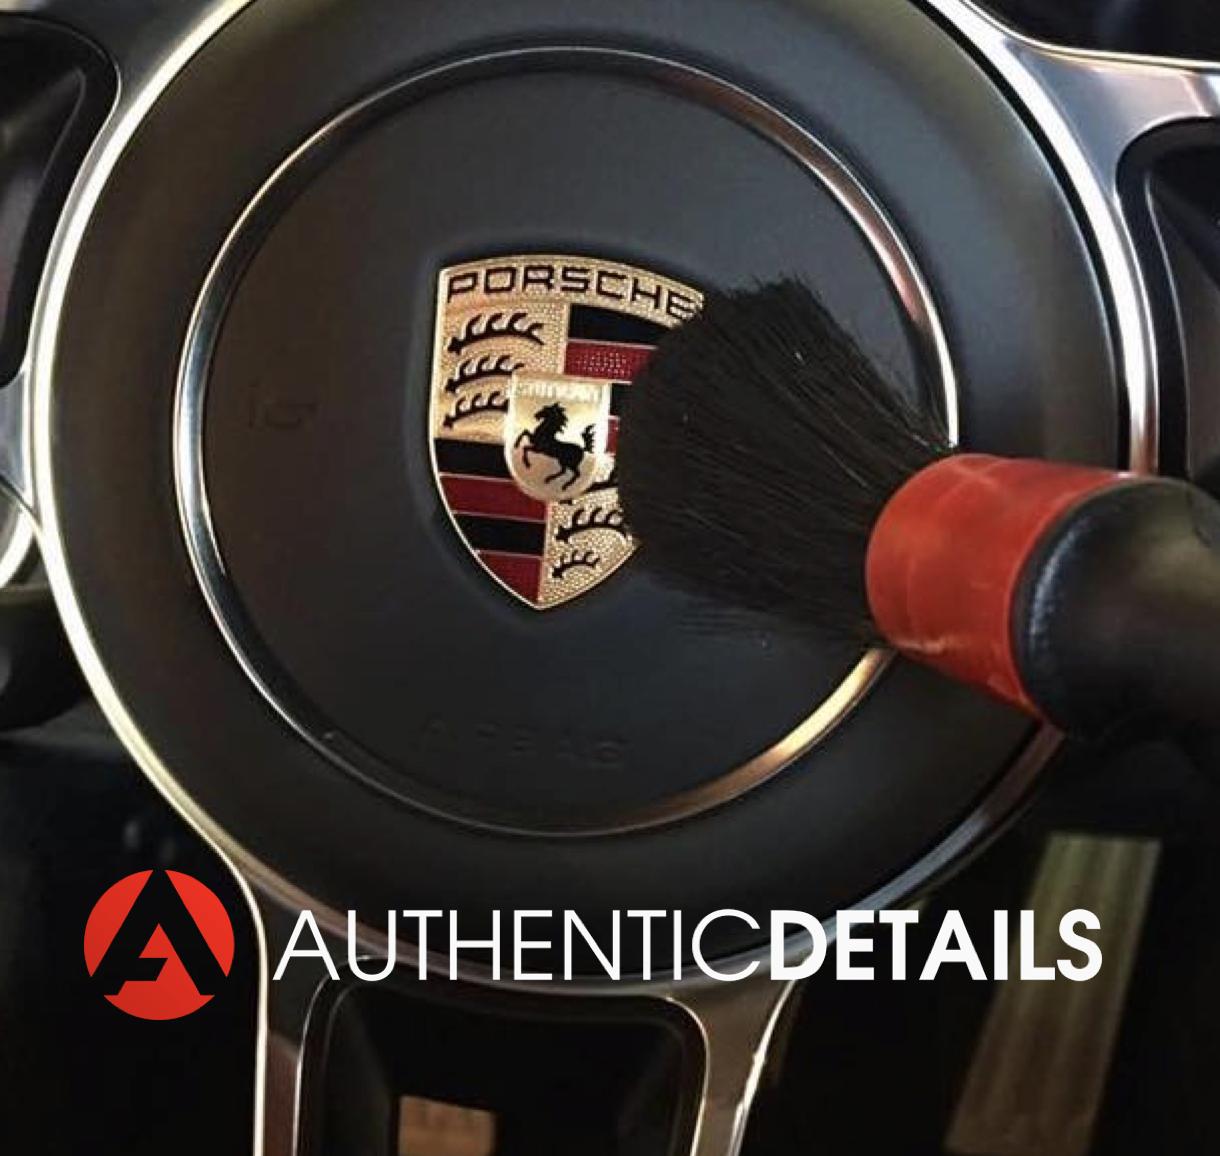 Fine brush on Porsche emblem to remove small dust particles